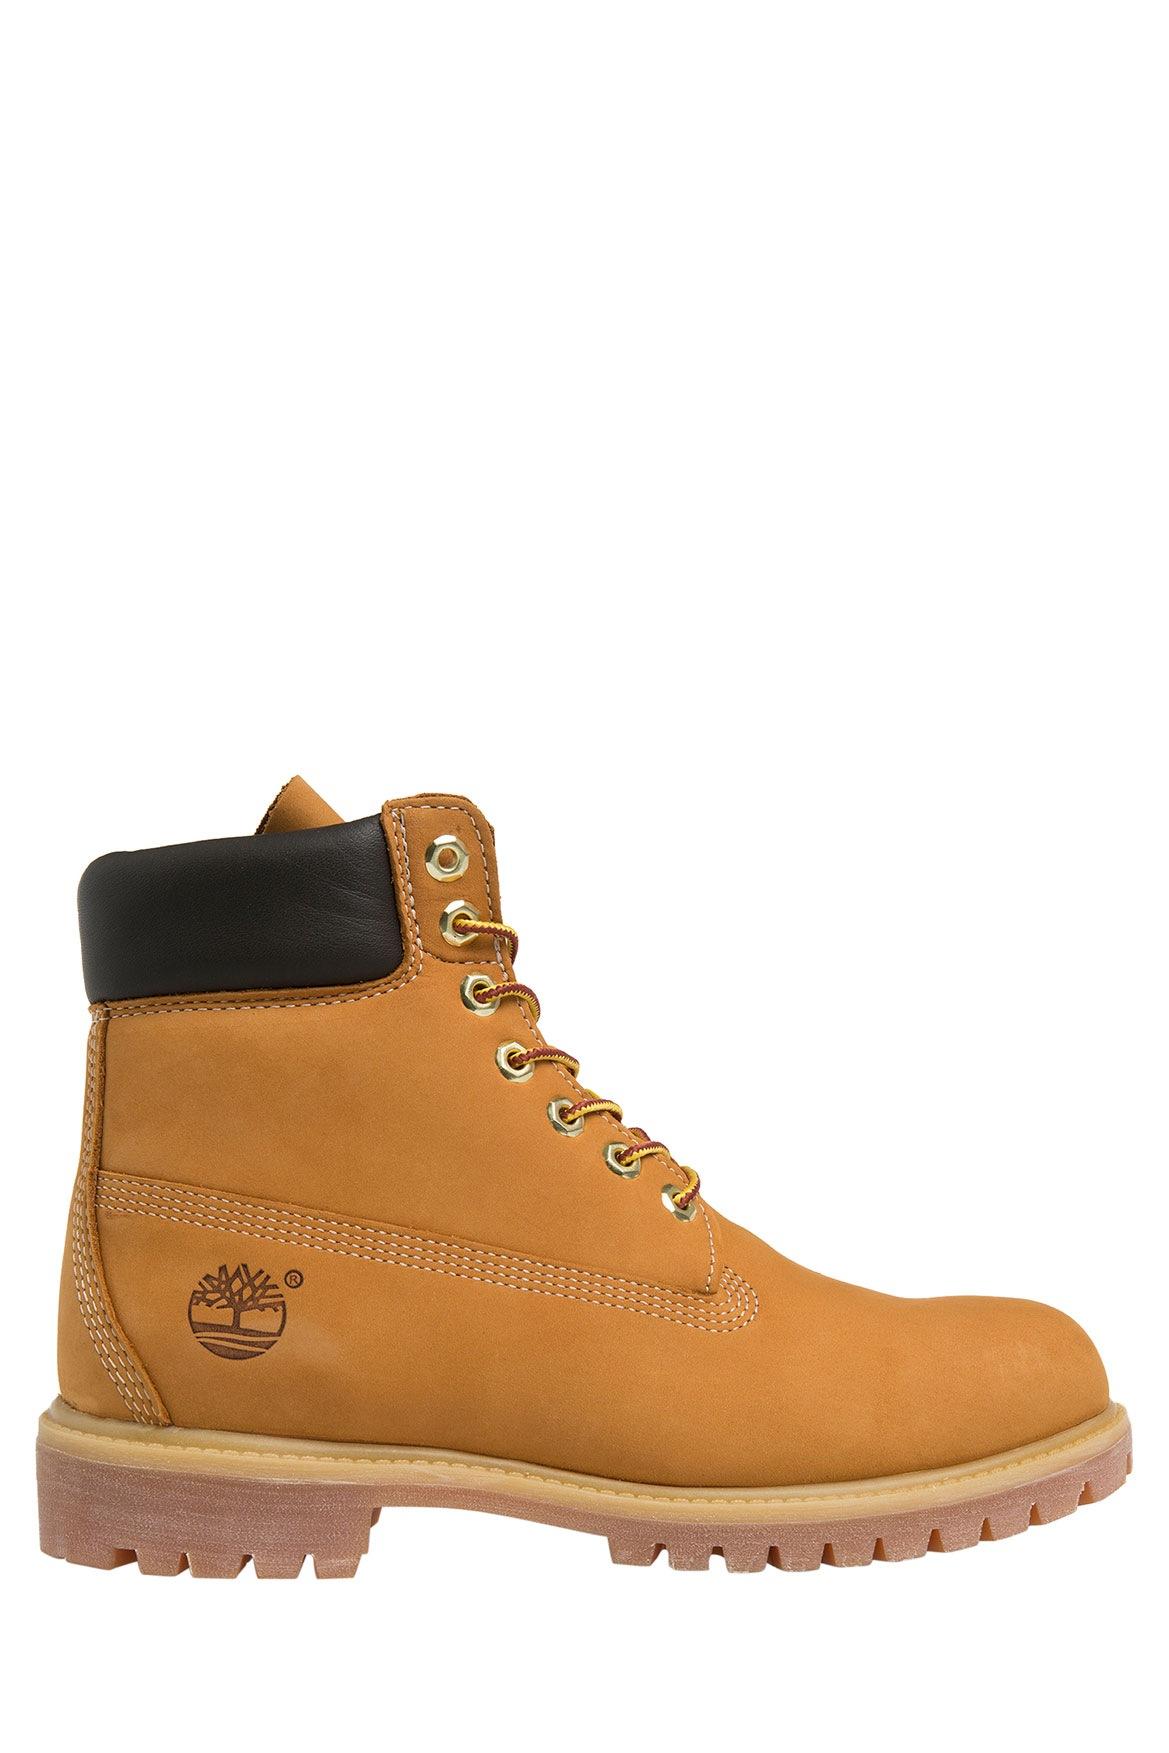 timberland shoes sale australia